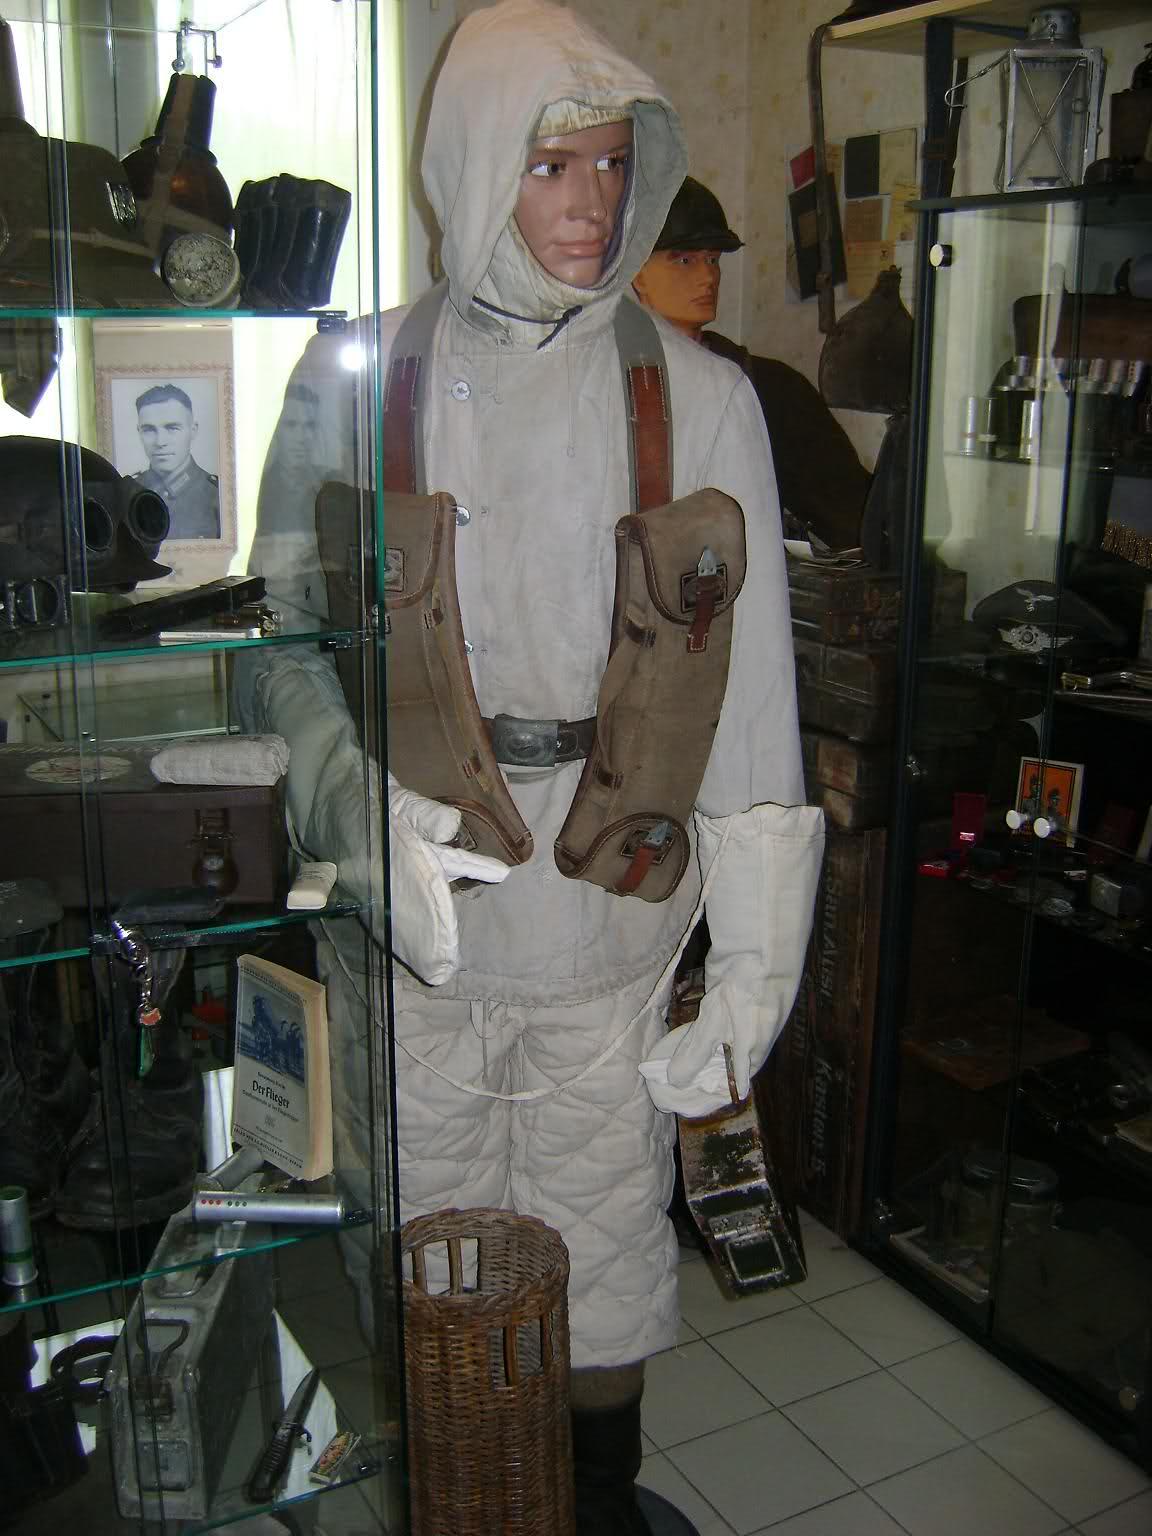 Collec de Minelab0 en allemand WW2 N1w3z6